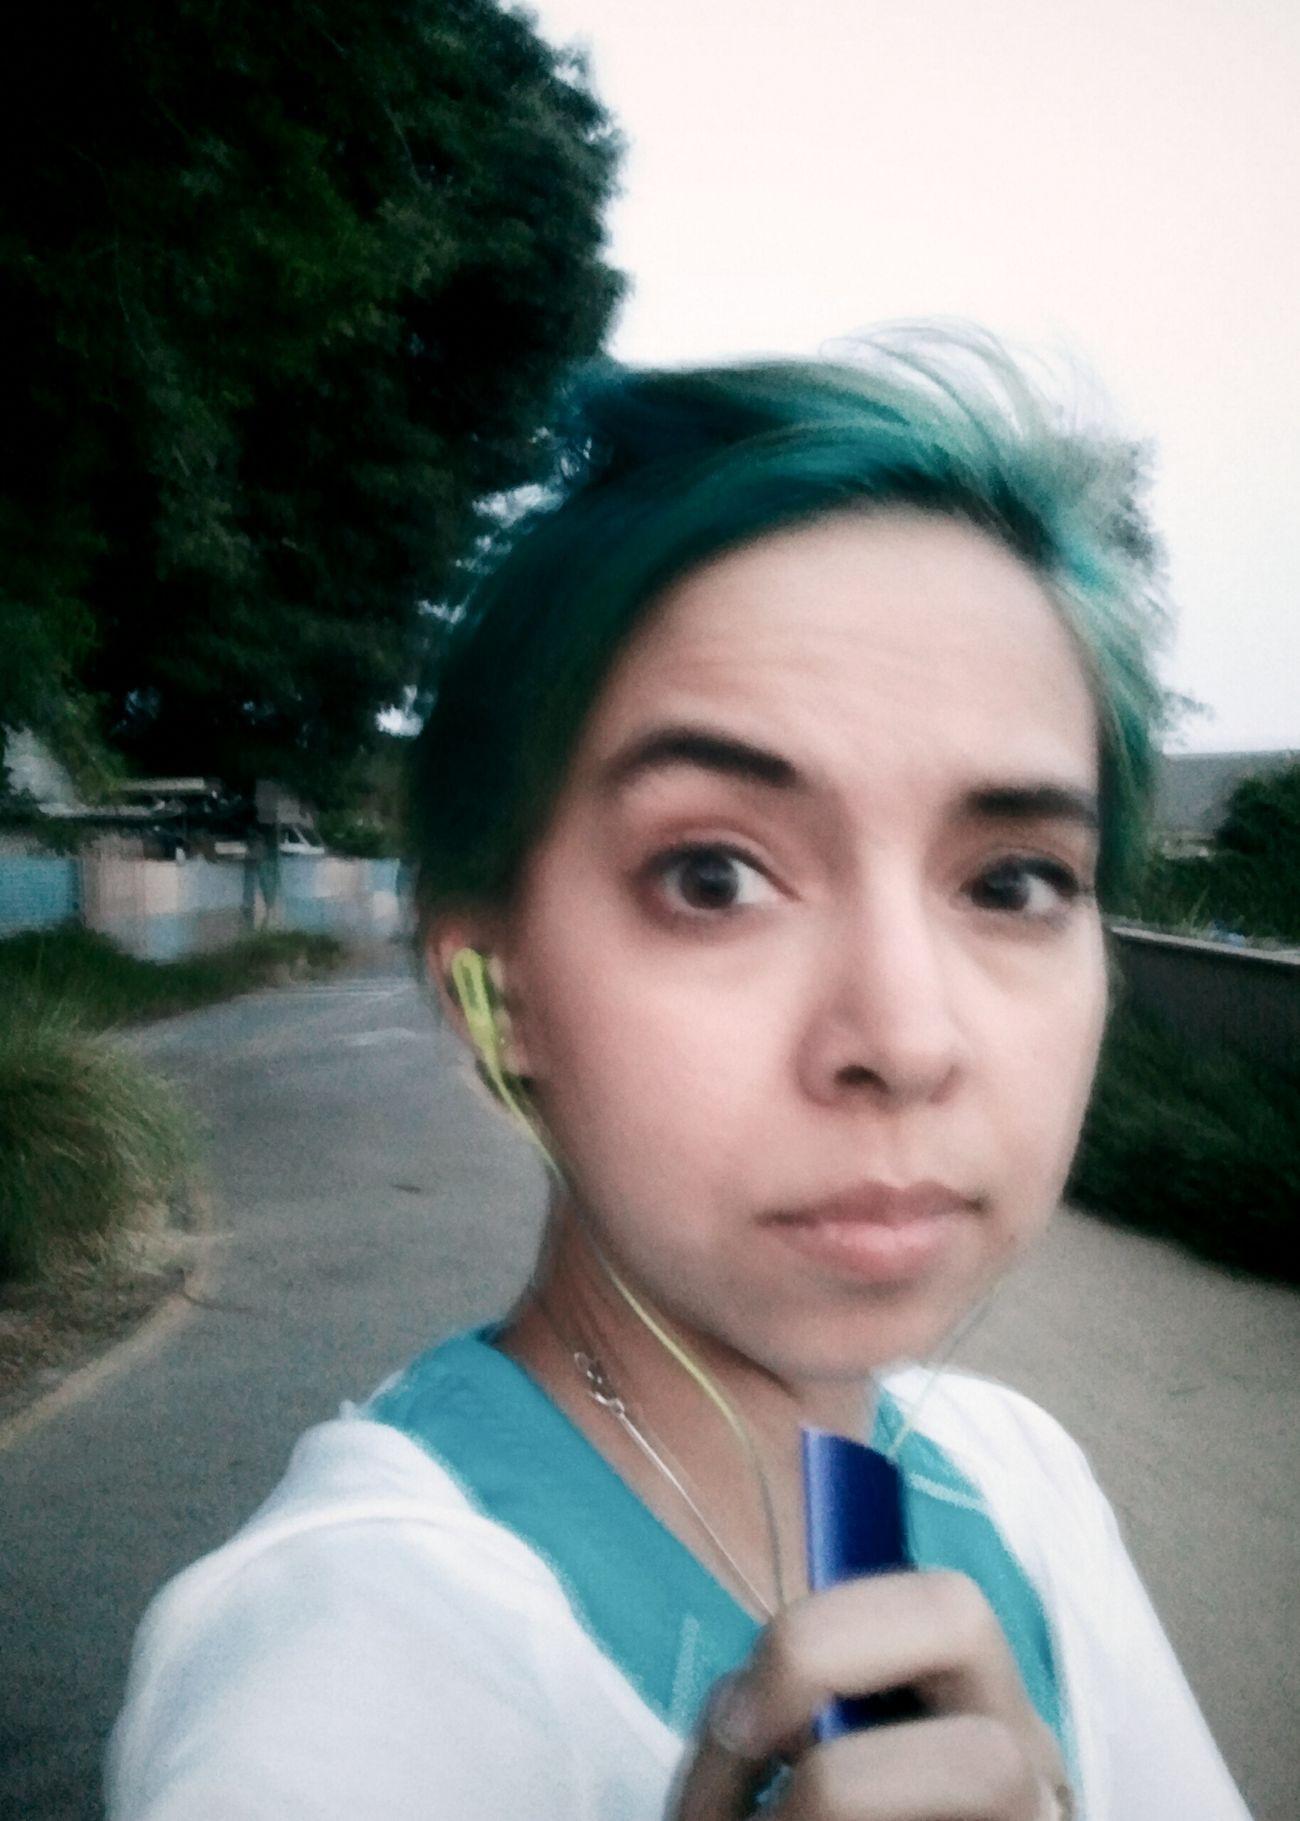 On a run.